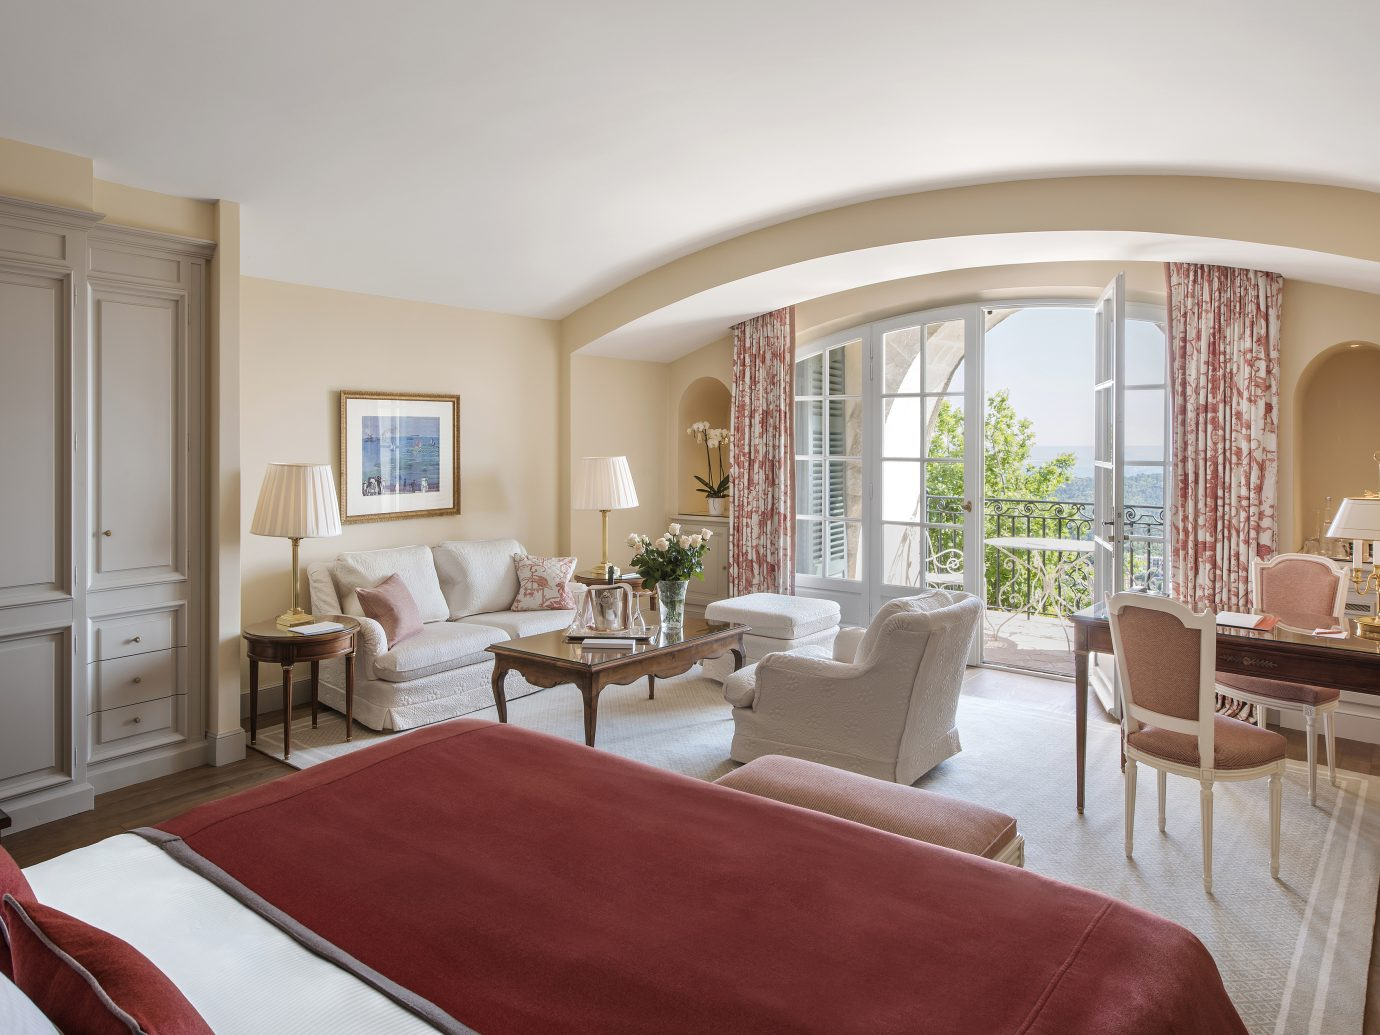 Bedroom at Château Saint-Martin & Spa